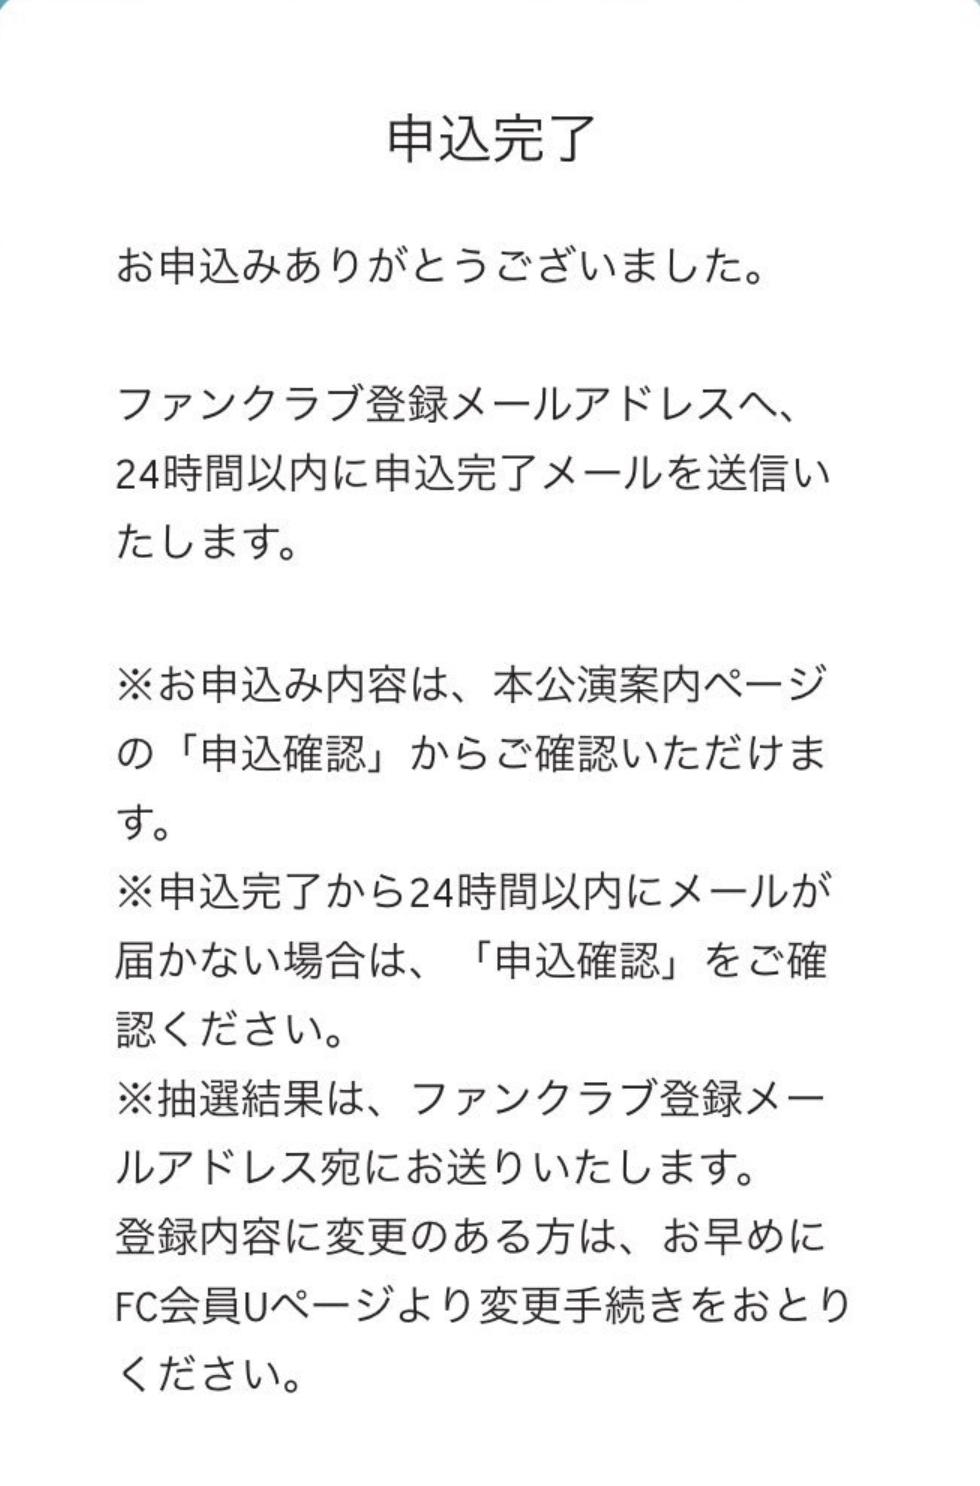 shubabu決済後に送られてくるメール